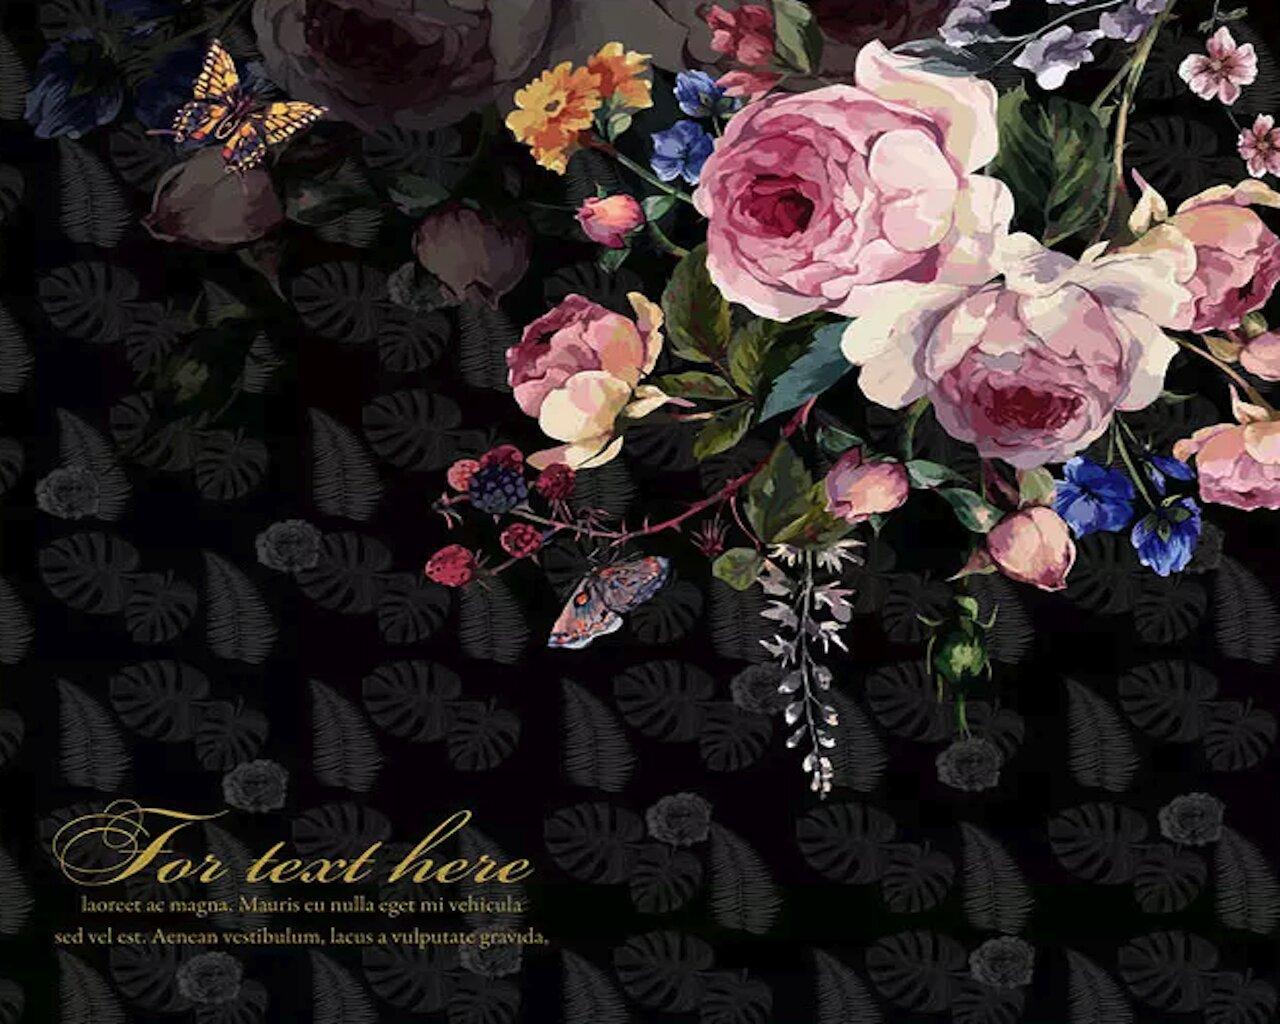 Gk Wall Design Pink Peony Flower Dark Floral Leaf Pattern Textile Wallpaper Wayfair